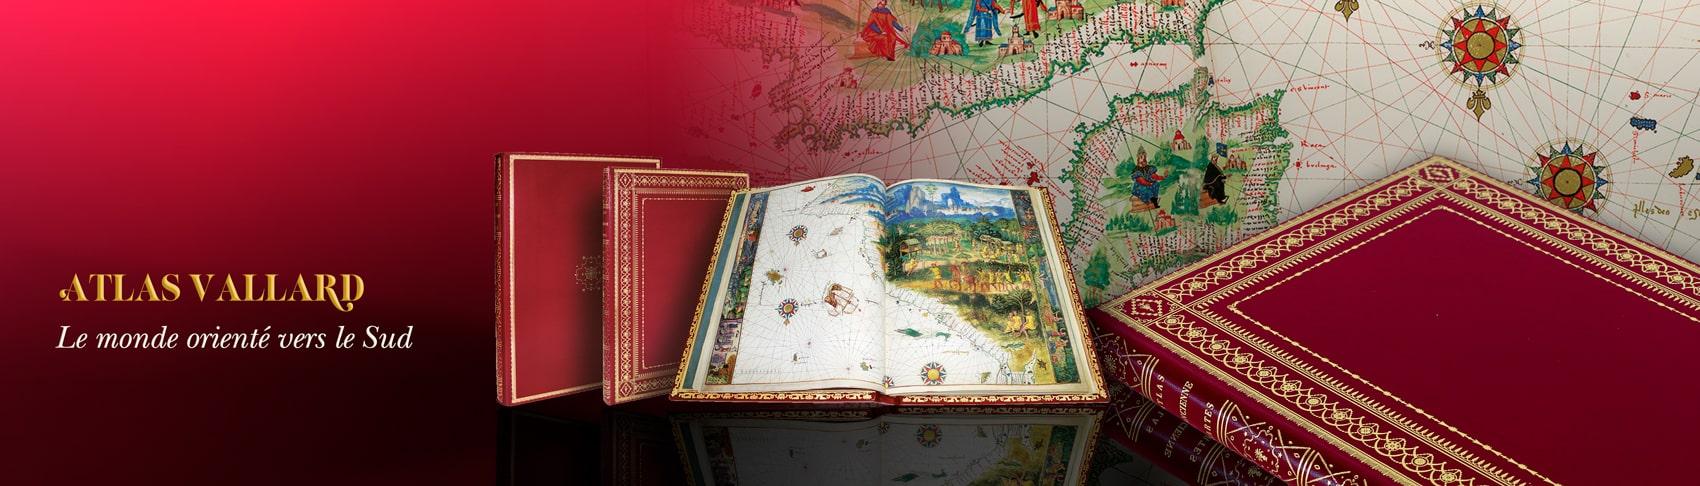 Atlas Vallard, le monde orienté vers le Sud